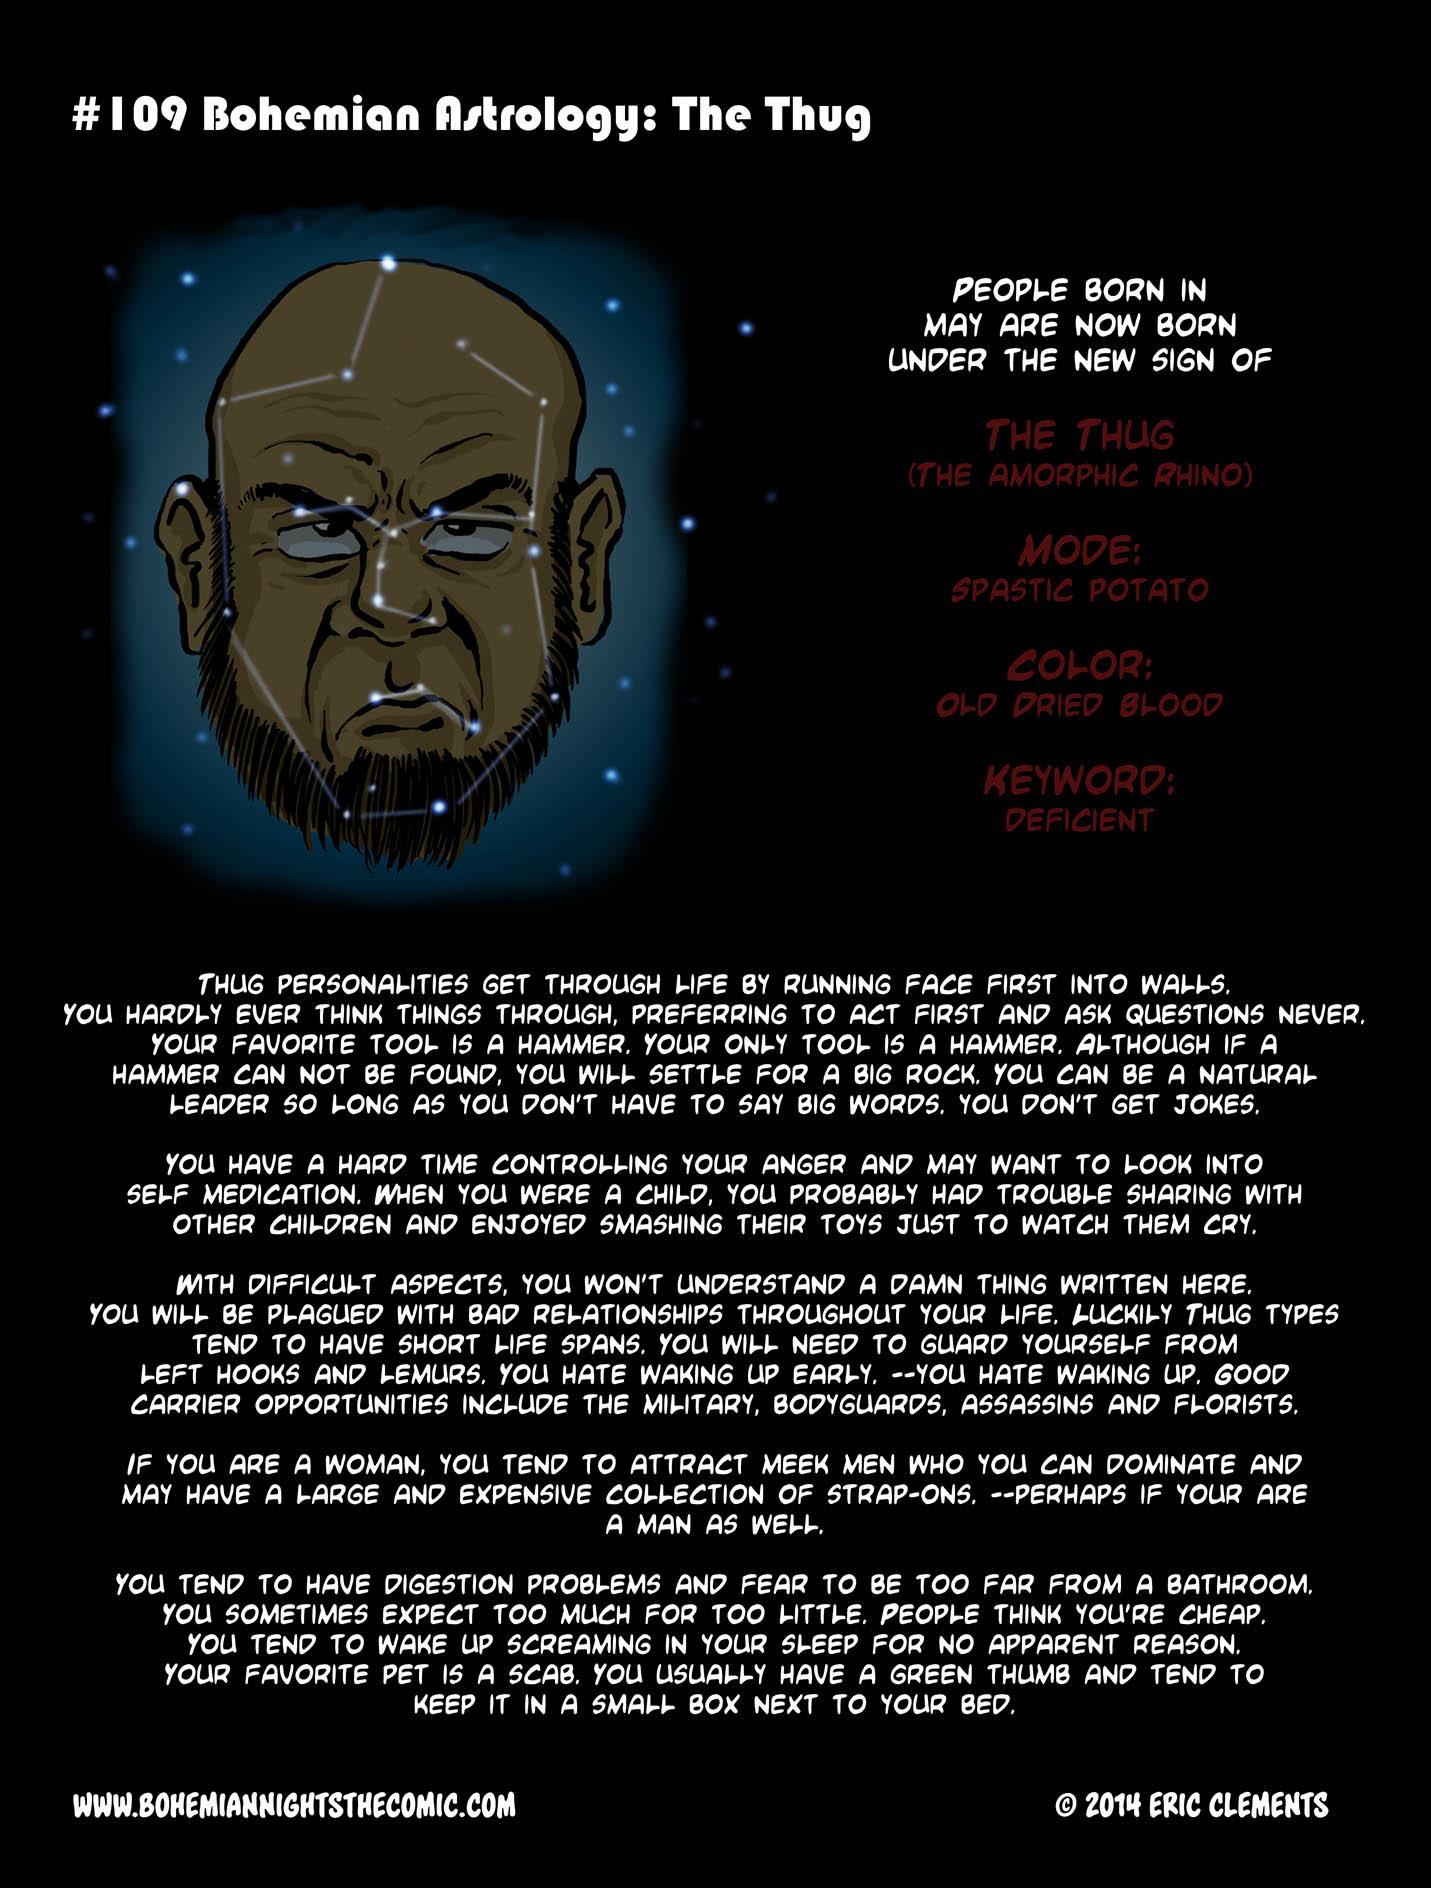 #109 Bohemian Astrology: The Thug